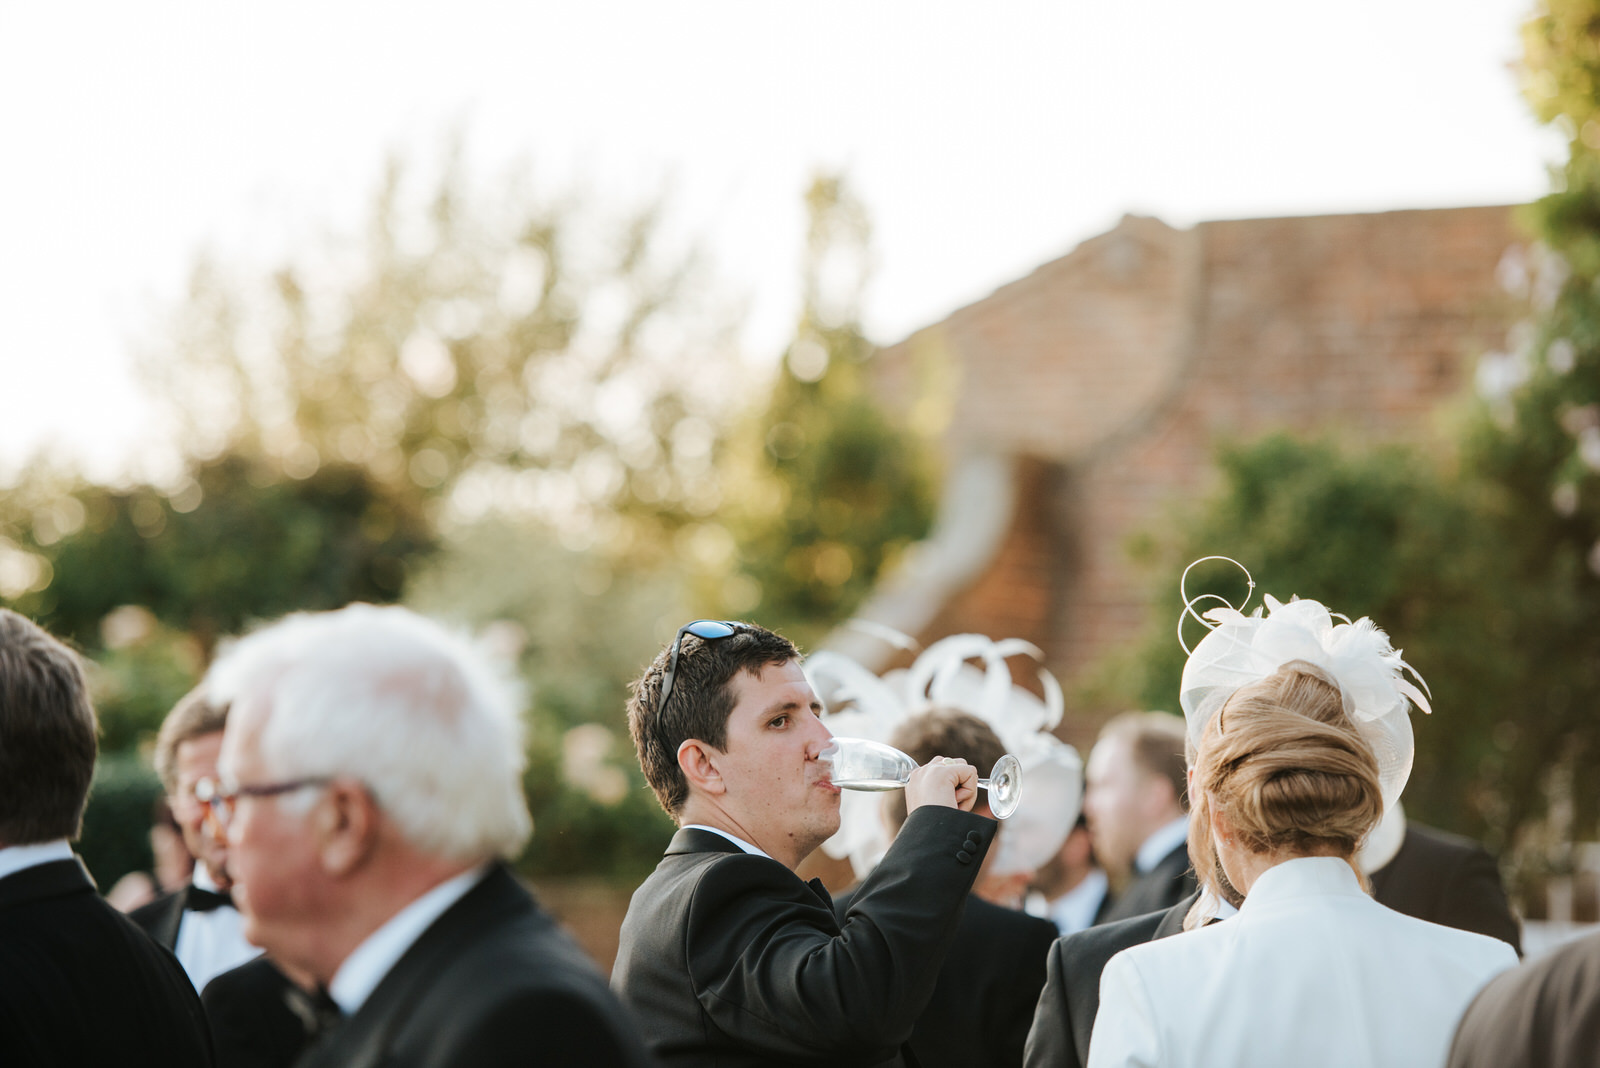 Groom's best man drinks champagne in beautiful, green garden wed